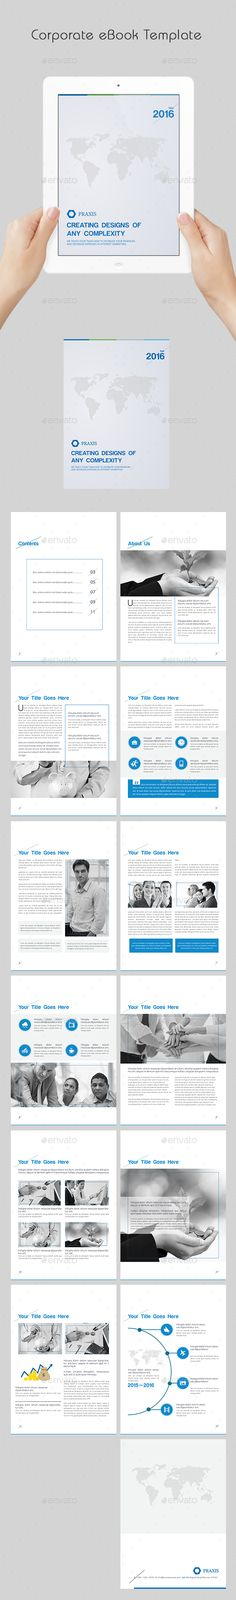 #Corporate eBook Template - Digital Books #ePublishing Download here: https://graphicriver.net/item/corporate-ebook-template/13961531?ref=alena994